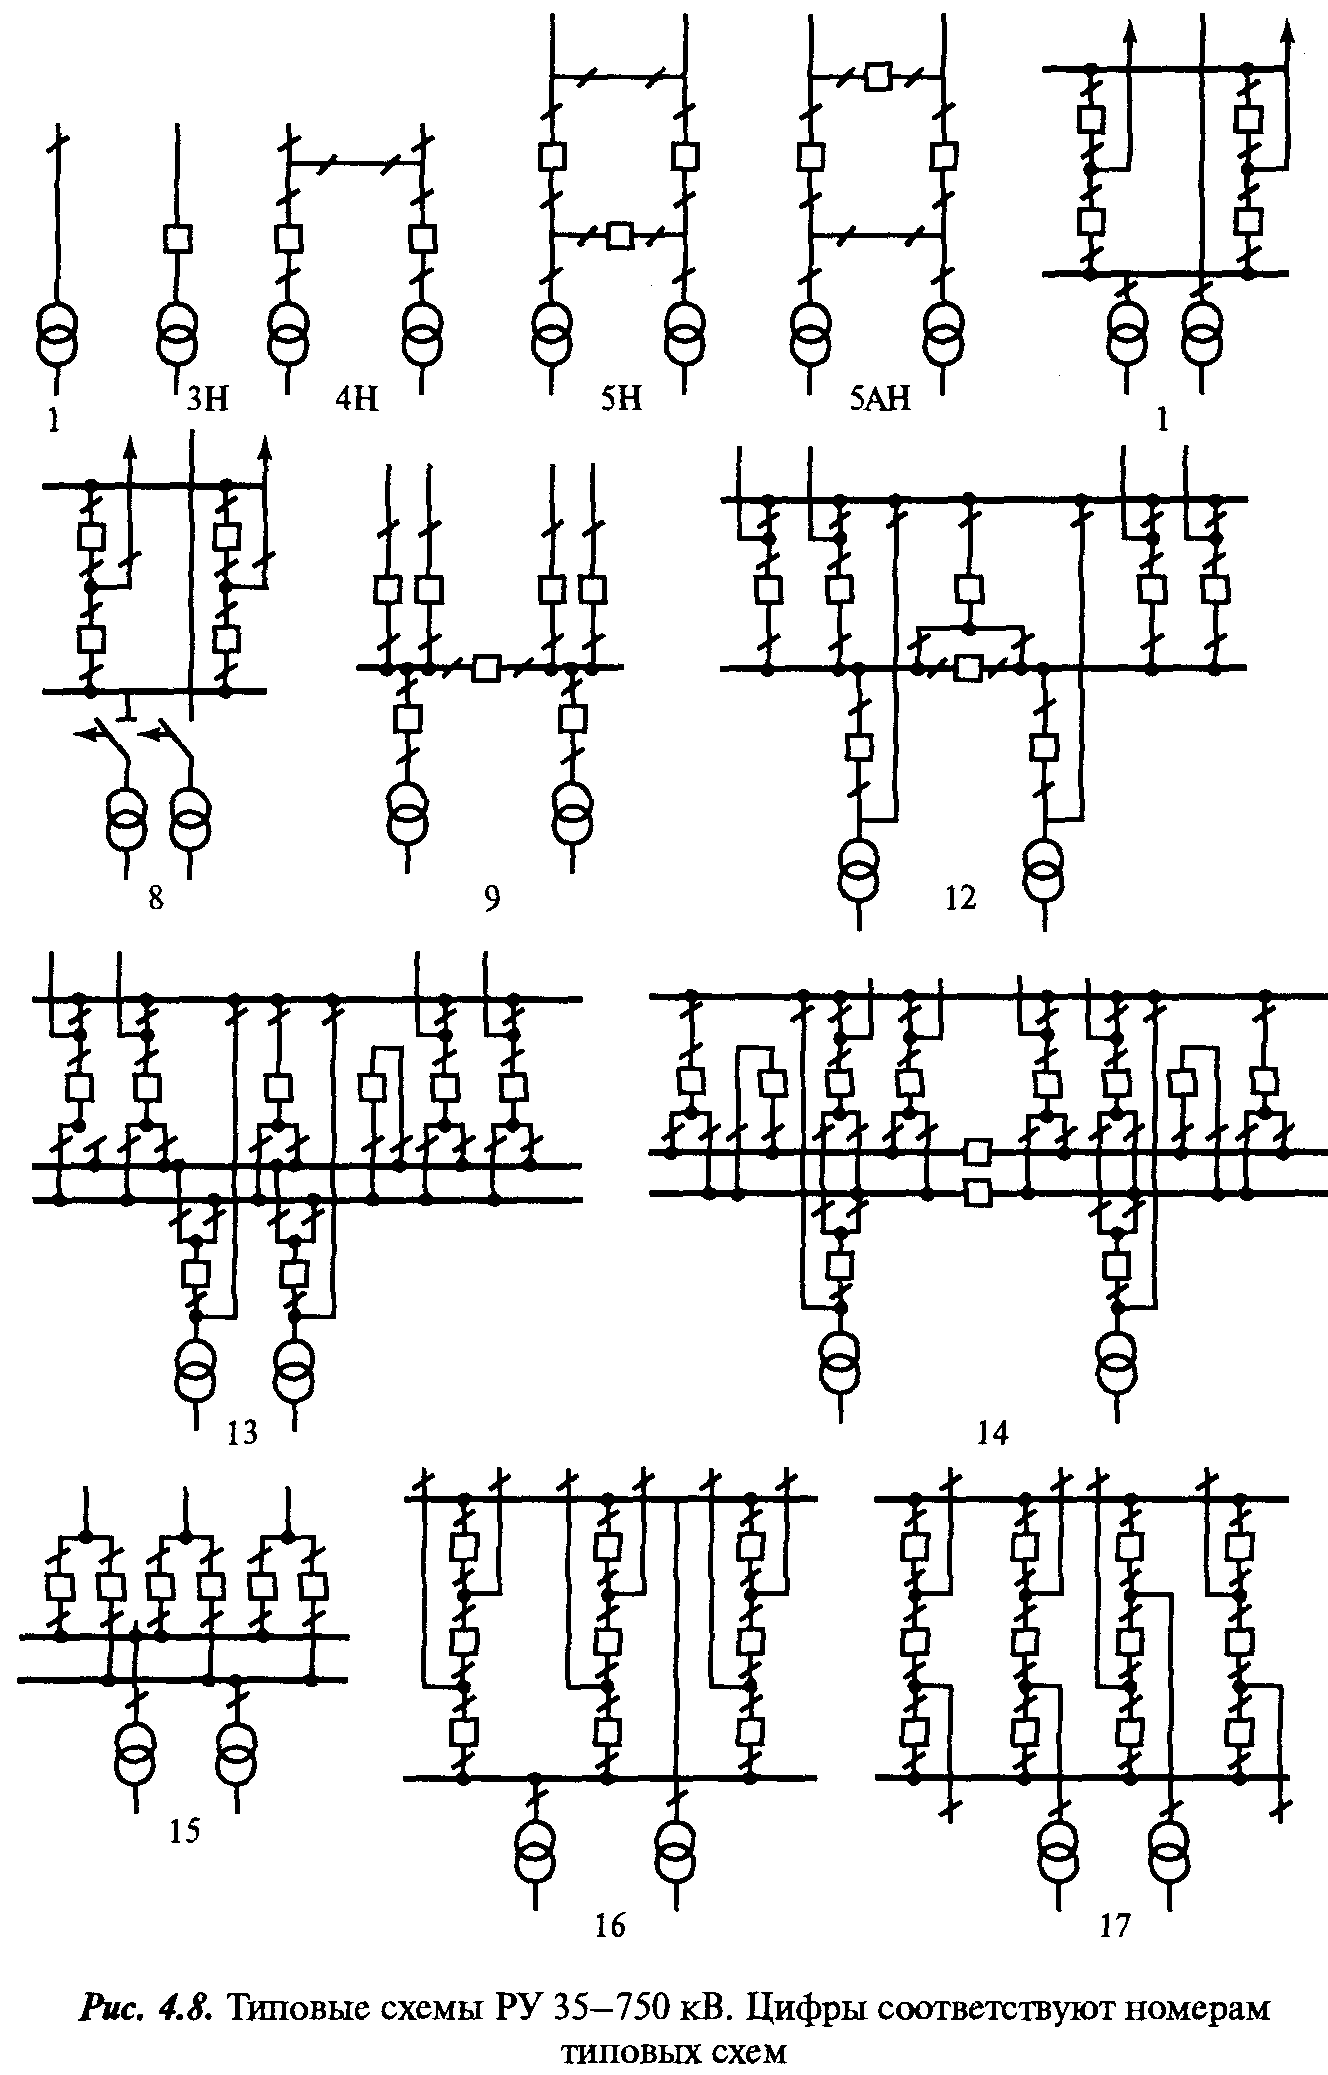 Типовая схема 110 5ан